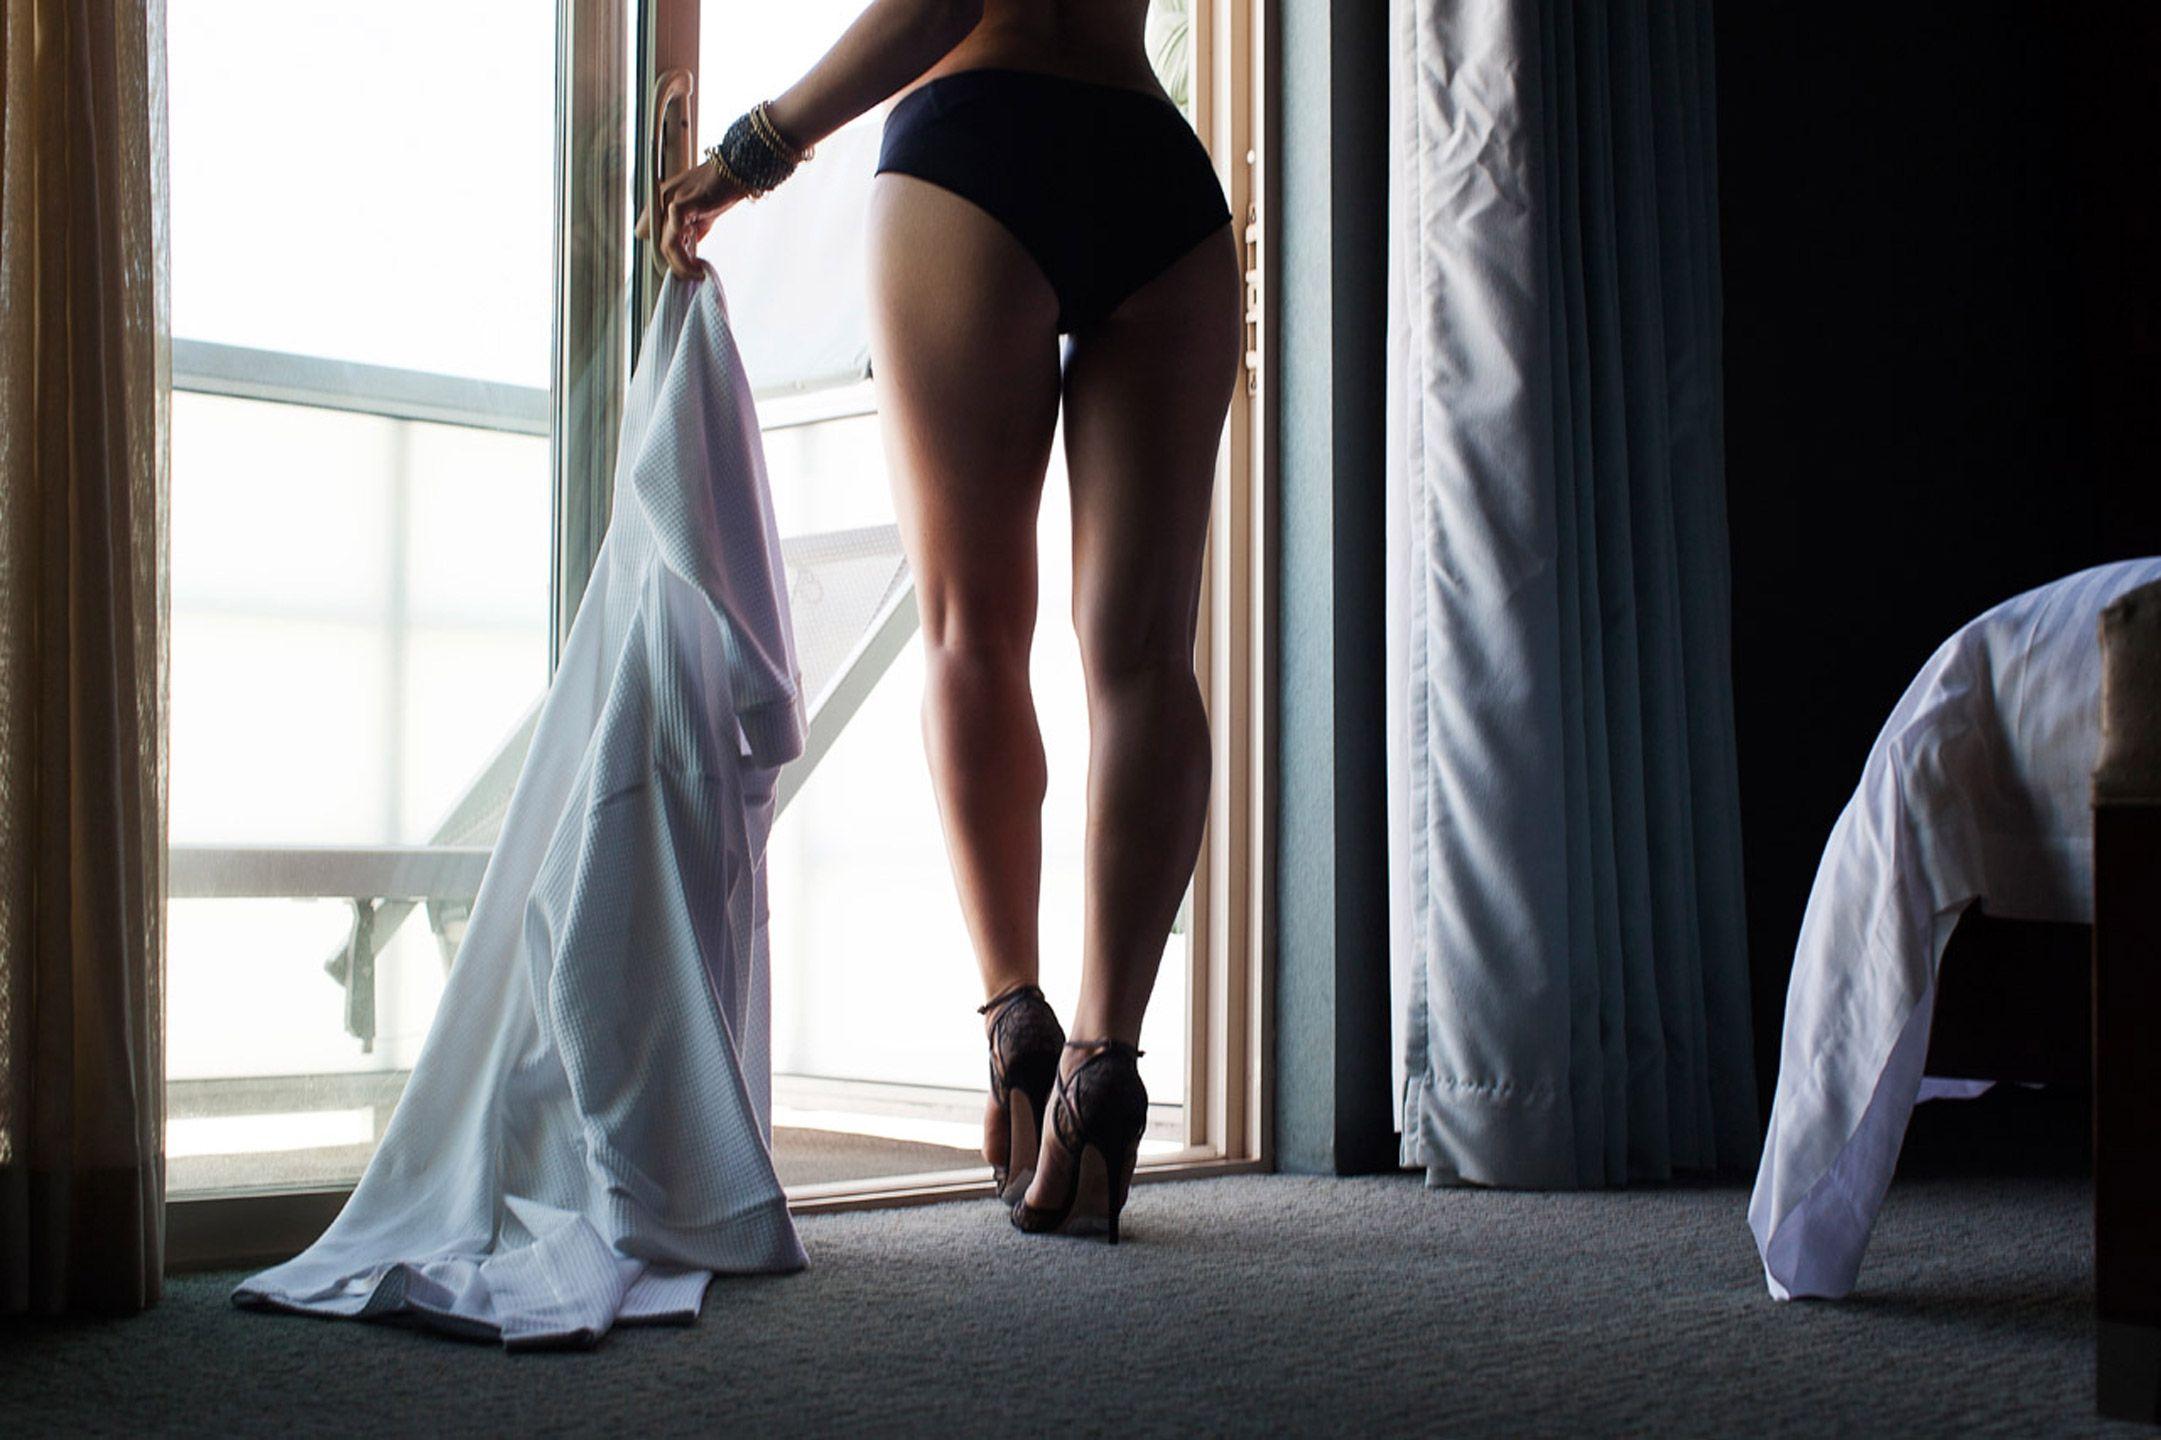 Amanda-Cerny-Topless-15